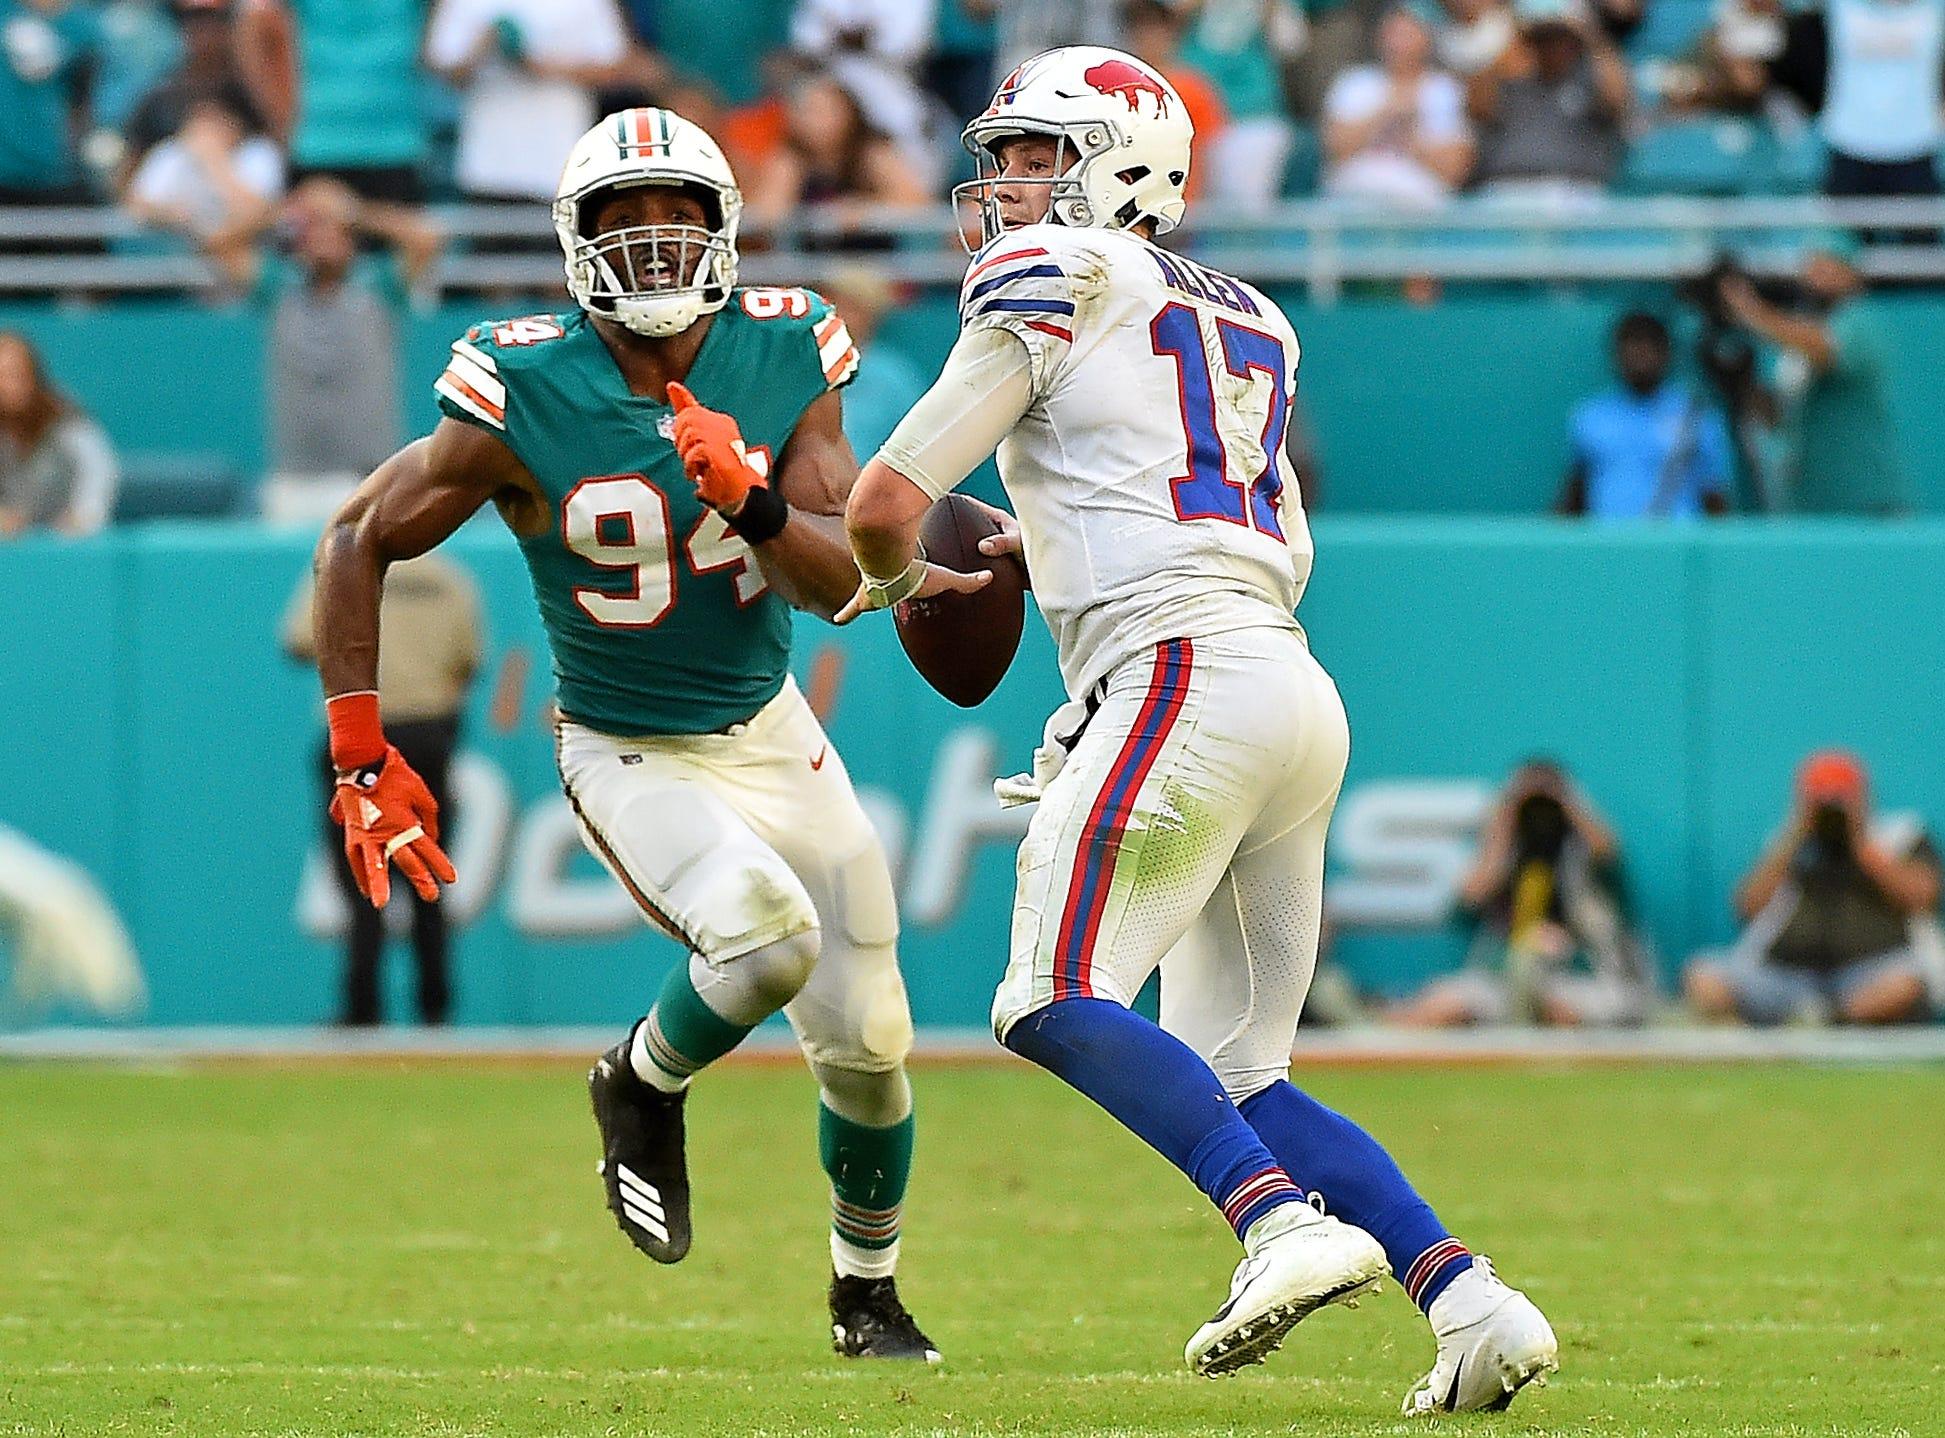 Dec 2, 2018; Miami Gardens, FL, USA; Buffalo Bills quarterback Josh Allen (17) attempts a pass under pressure from Miami Dolphins defensive end Robert Quinn (94) during the second half at Hard Rock Stadium. Mandatory Credit: Jasen Vinlove-USA TODAY Sports